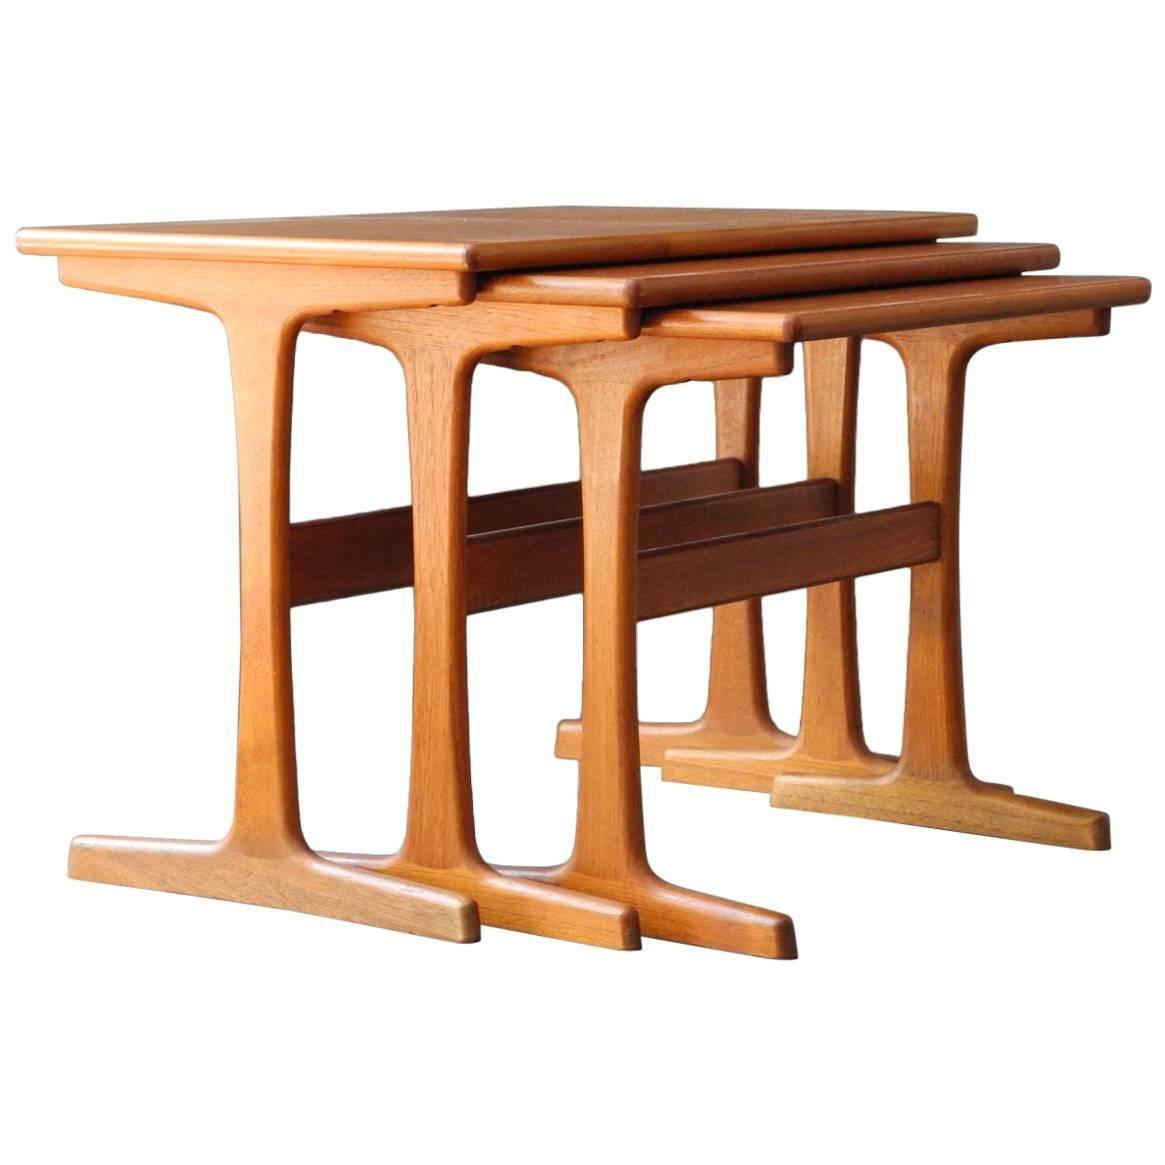 Kai Kristiansen Teak Set of Three Nesting Tables, Denmark Vildbjerg Møbelfabrik